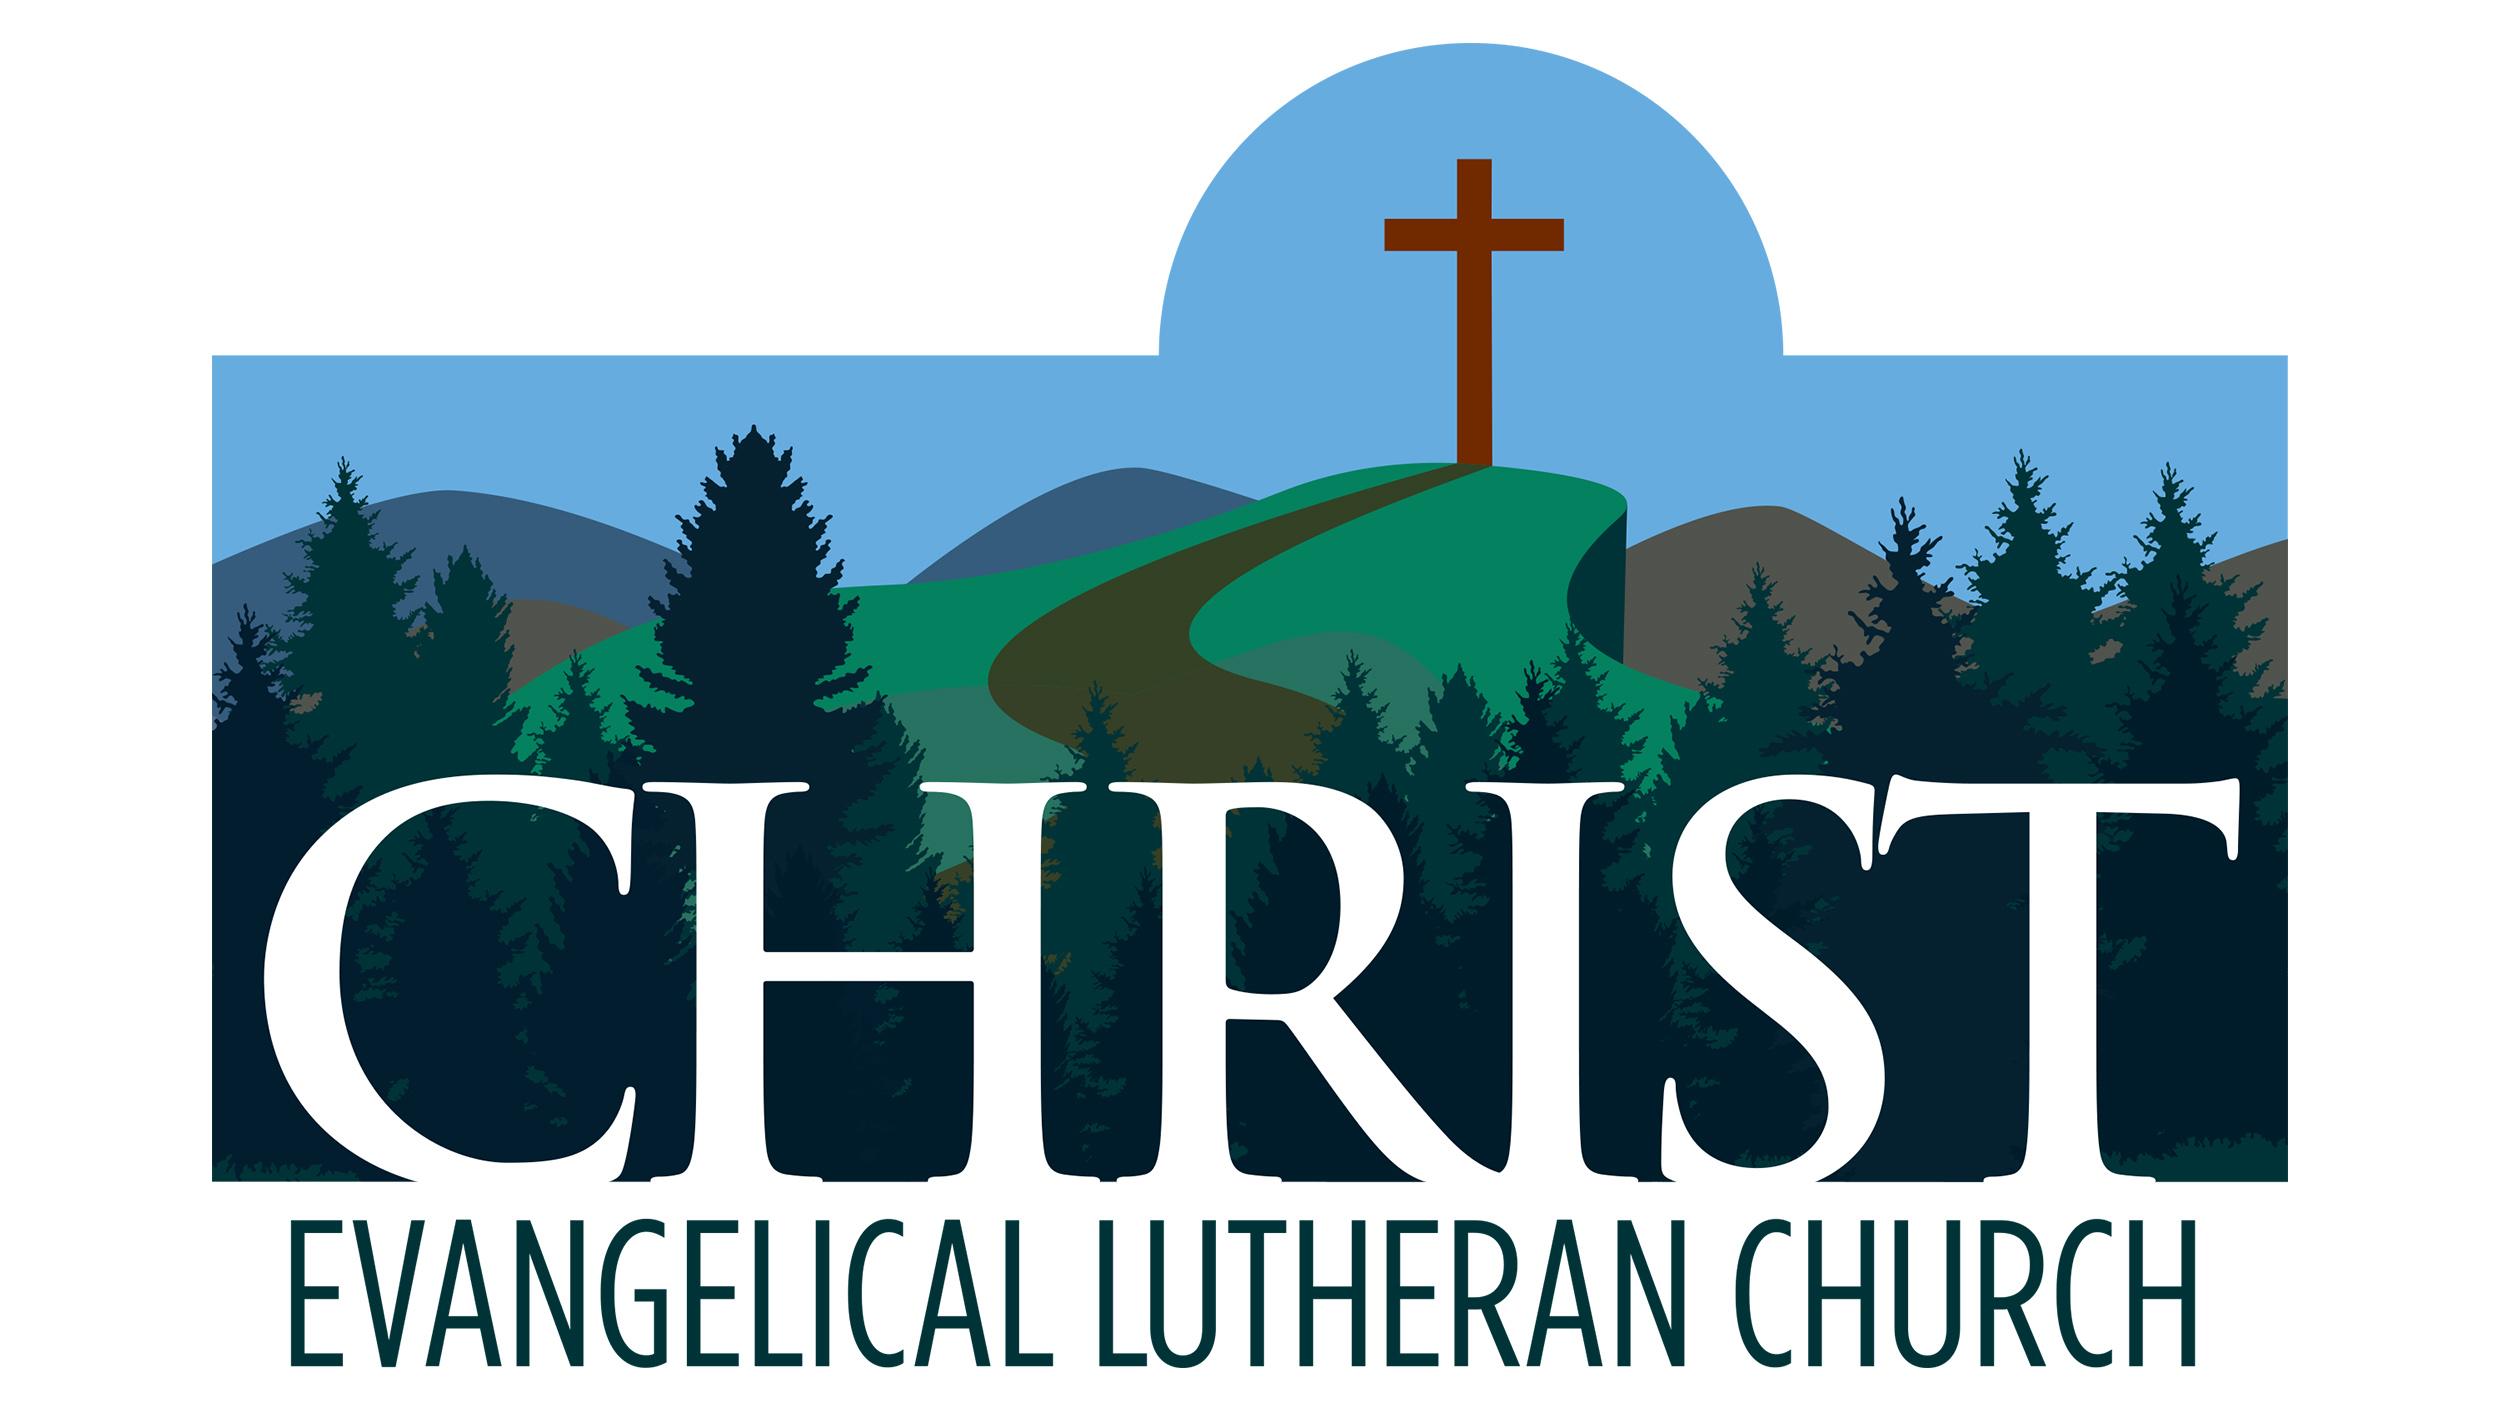 Christ-Evangelical-Lutheran-Church-Northwoods-Logos-Brand-Identity.jpg